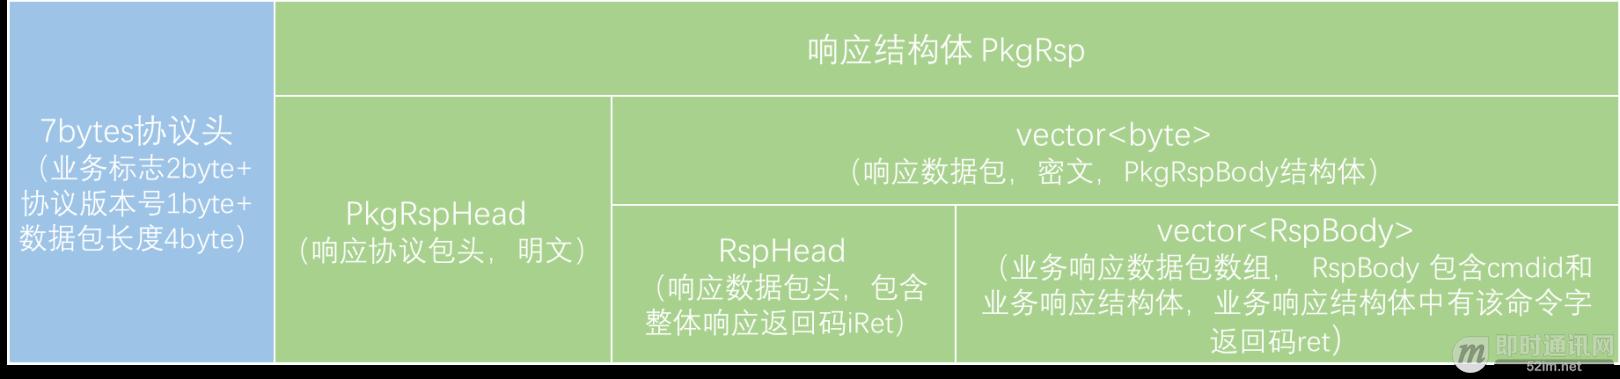 APP与后台通信数据格式的演进:从文本协议到二进制协议_2.png